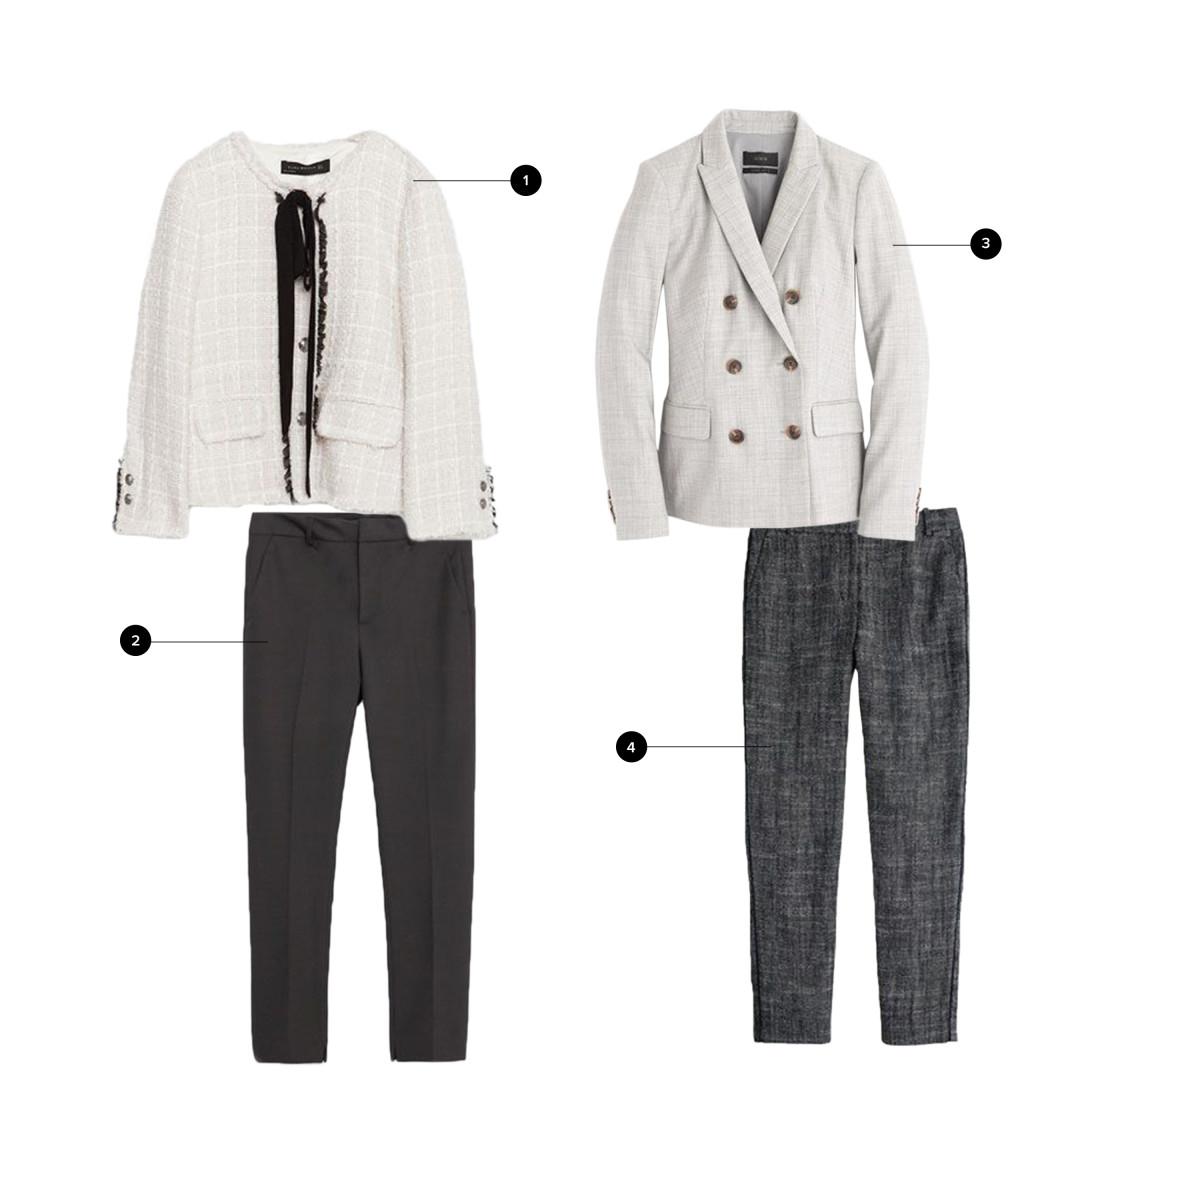 1. Zara, $149/ 2. Zara, $50 / 3. J.Crew, $238/ 4. J.Crew, $148